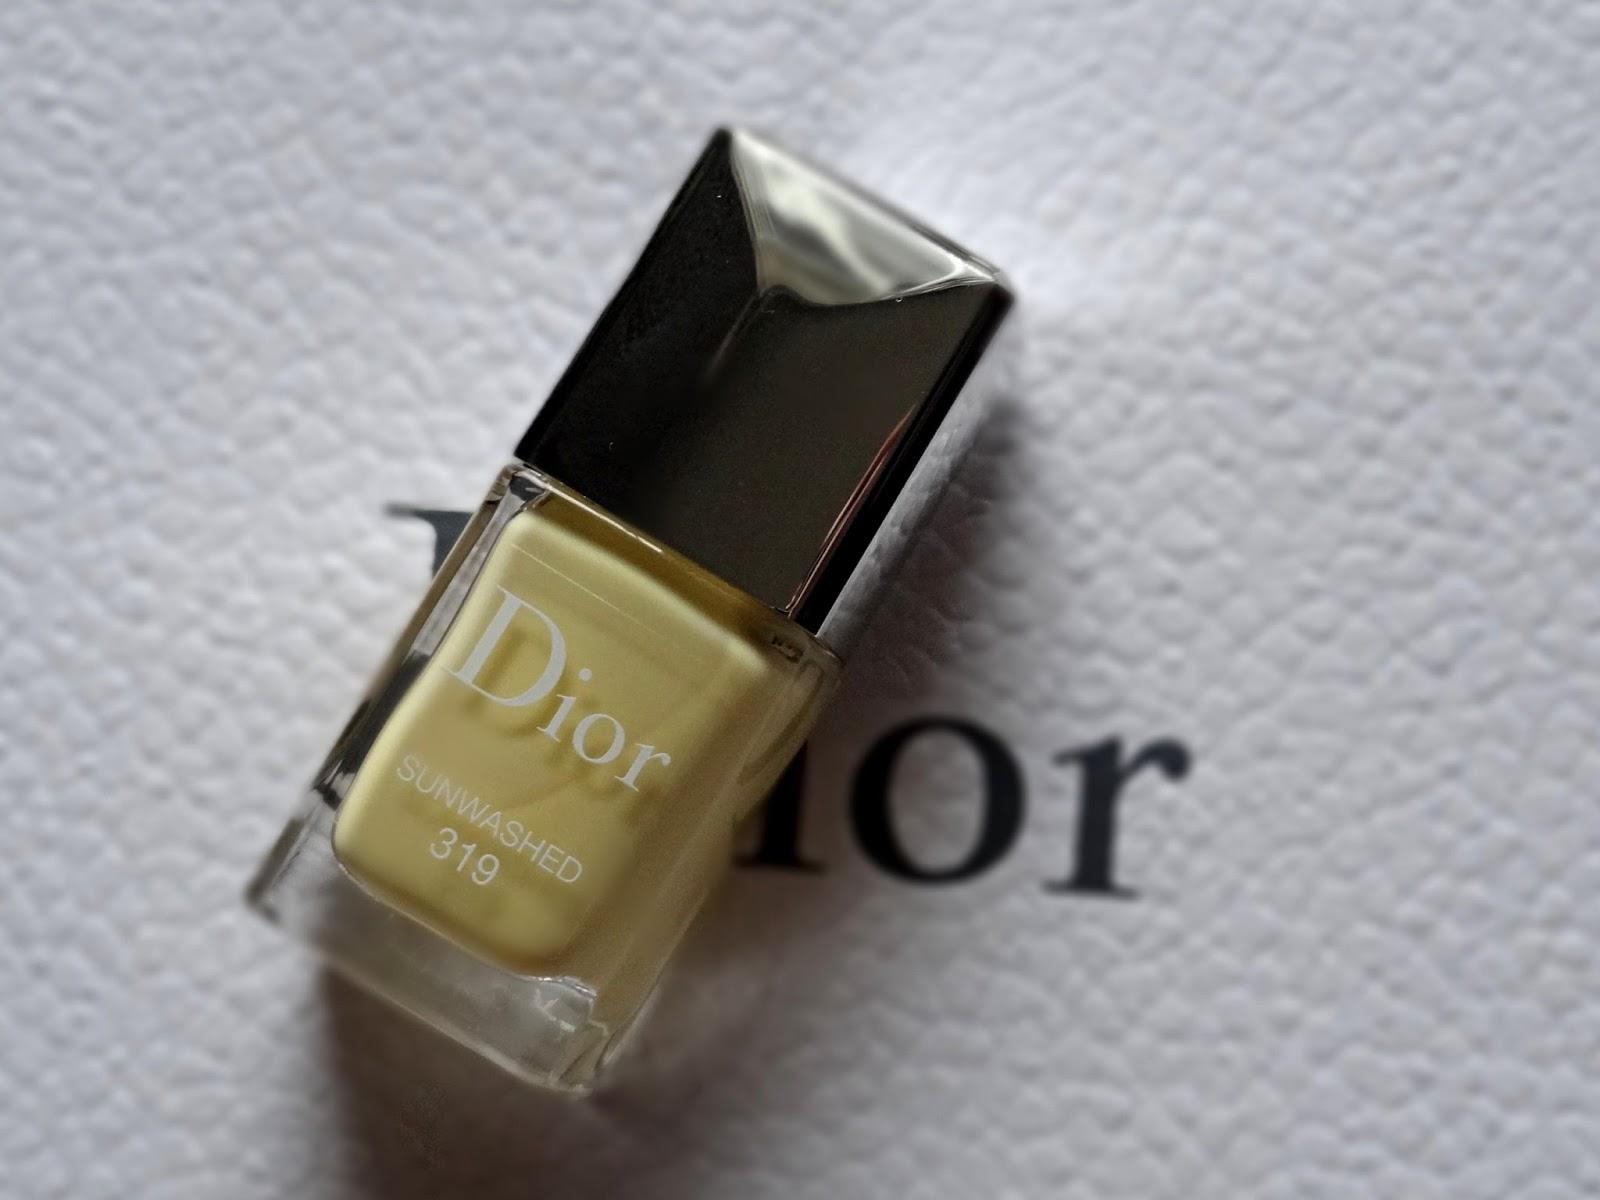 Dior Vernis Sunwashed 319   Dior Tie Dye Summer 2015 Makeup Collection